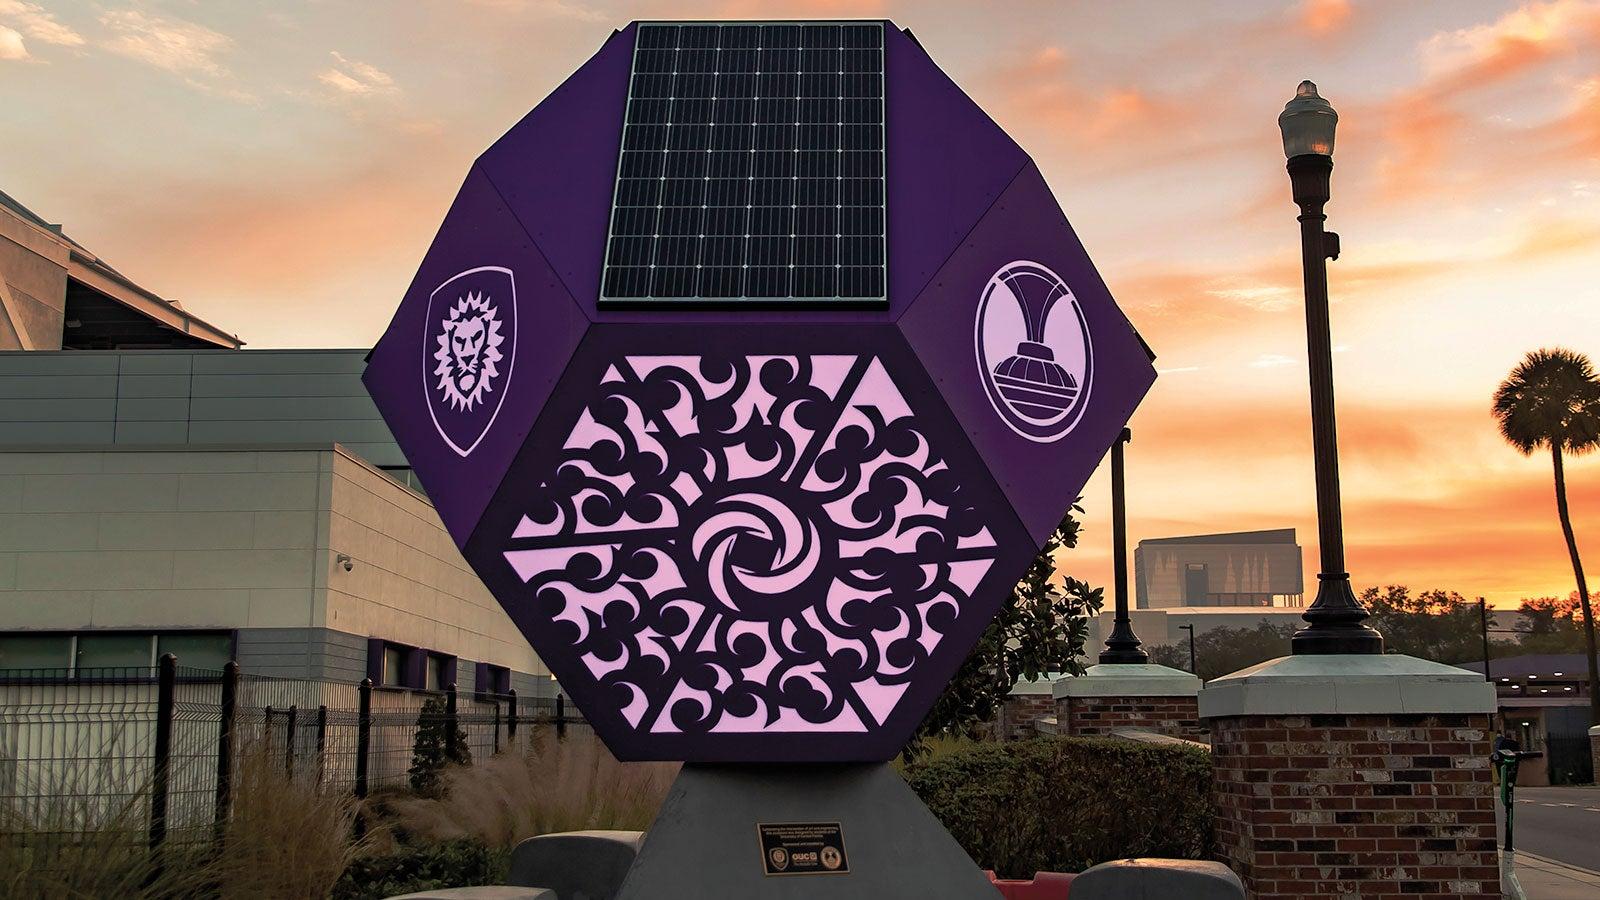 Custom Solar Sculpture Built by UCF Students